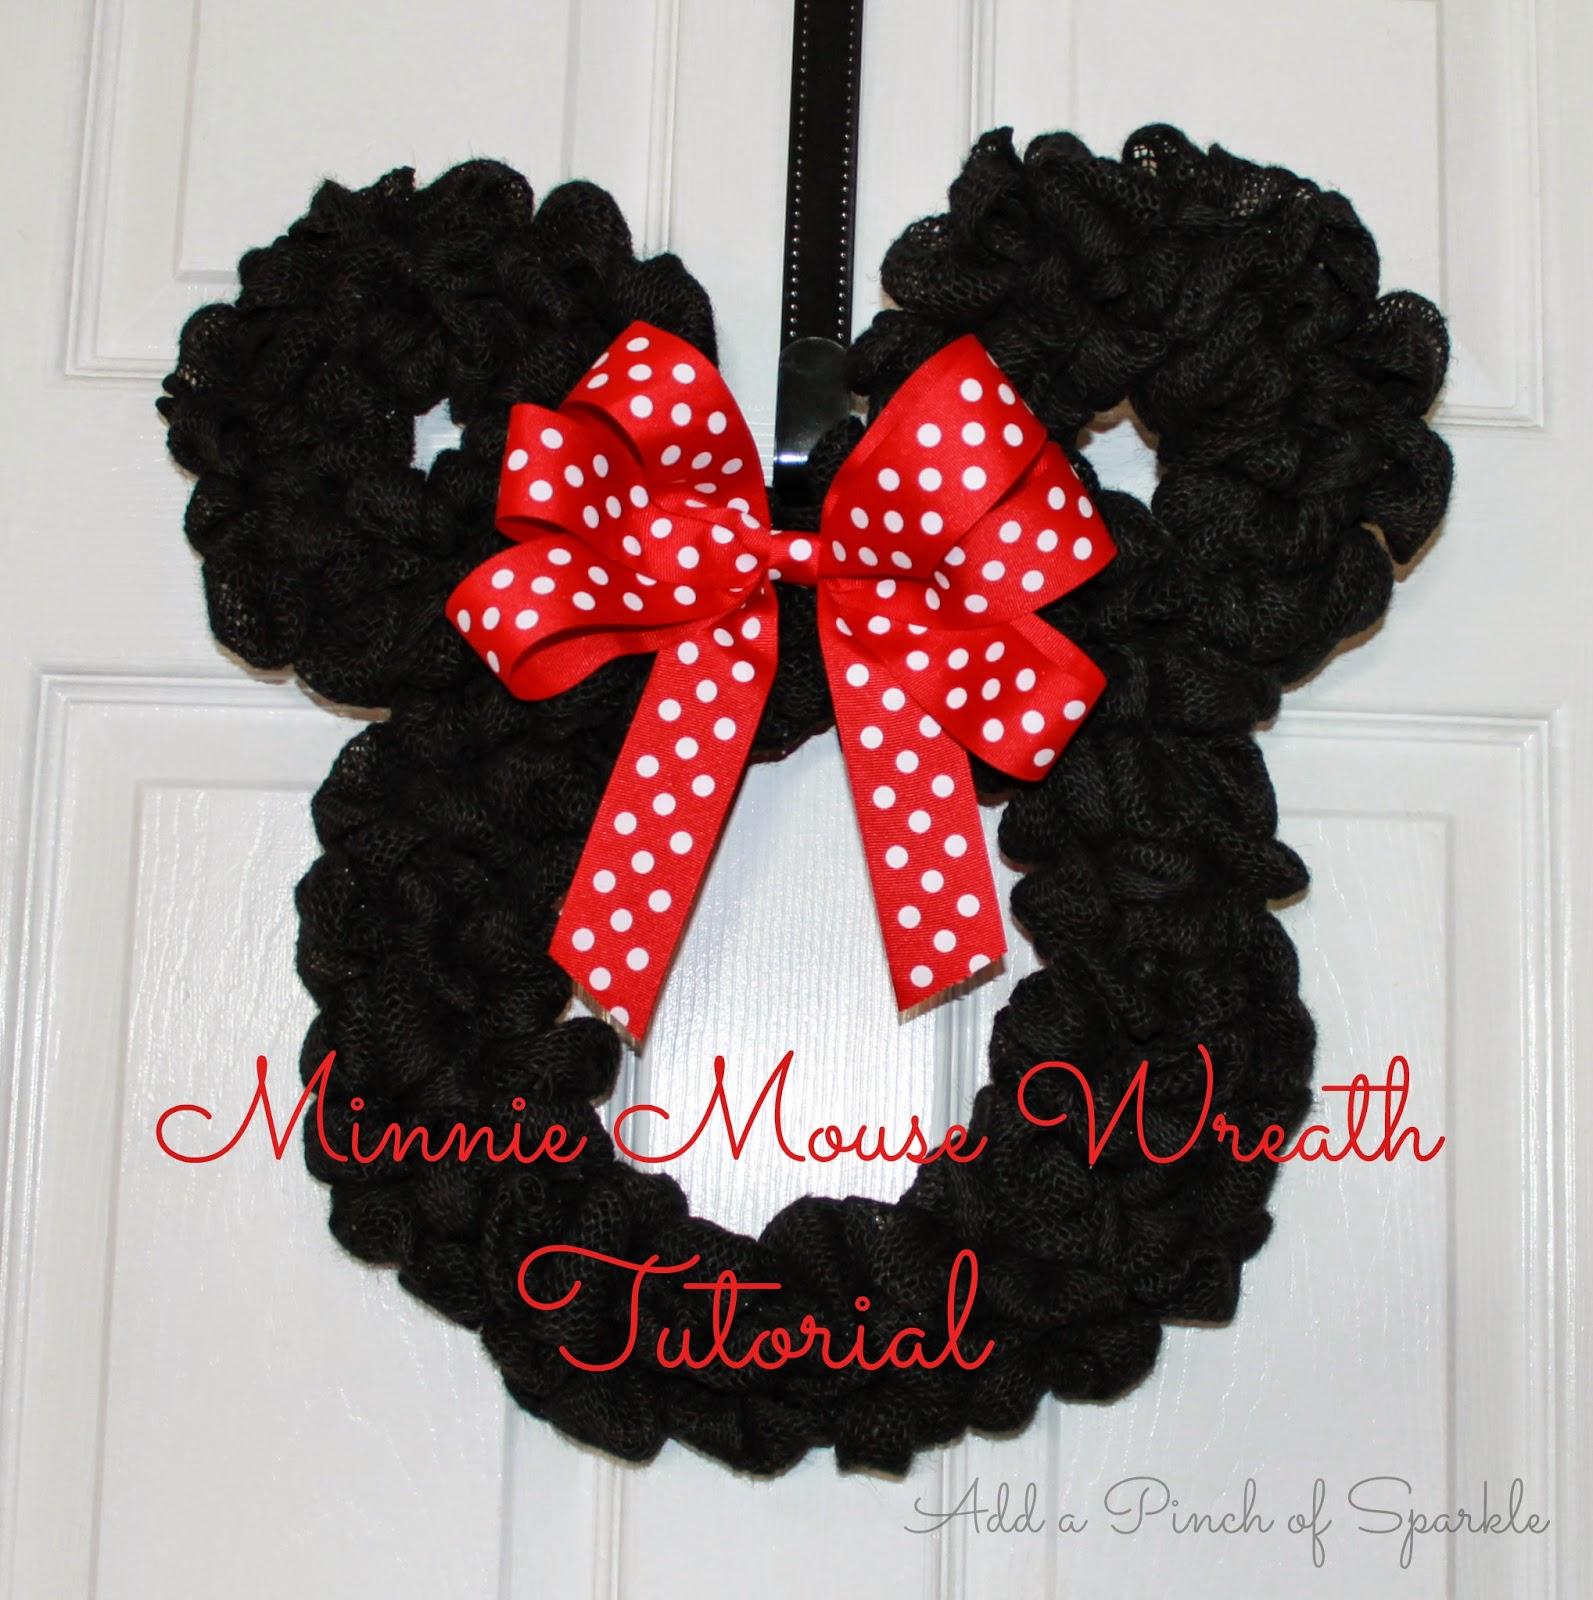 Minnie Mouse Wreath: Tutorial